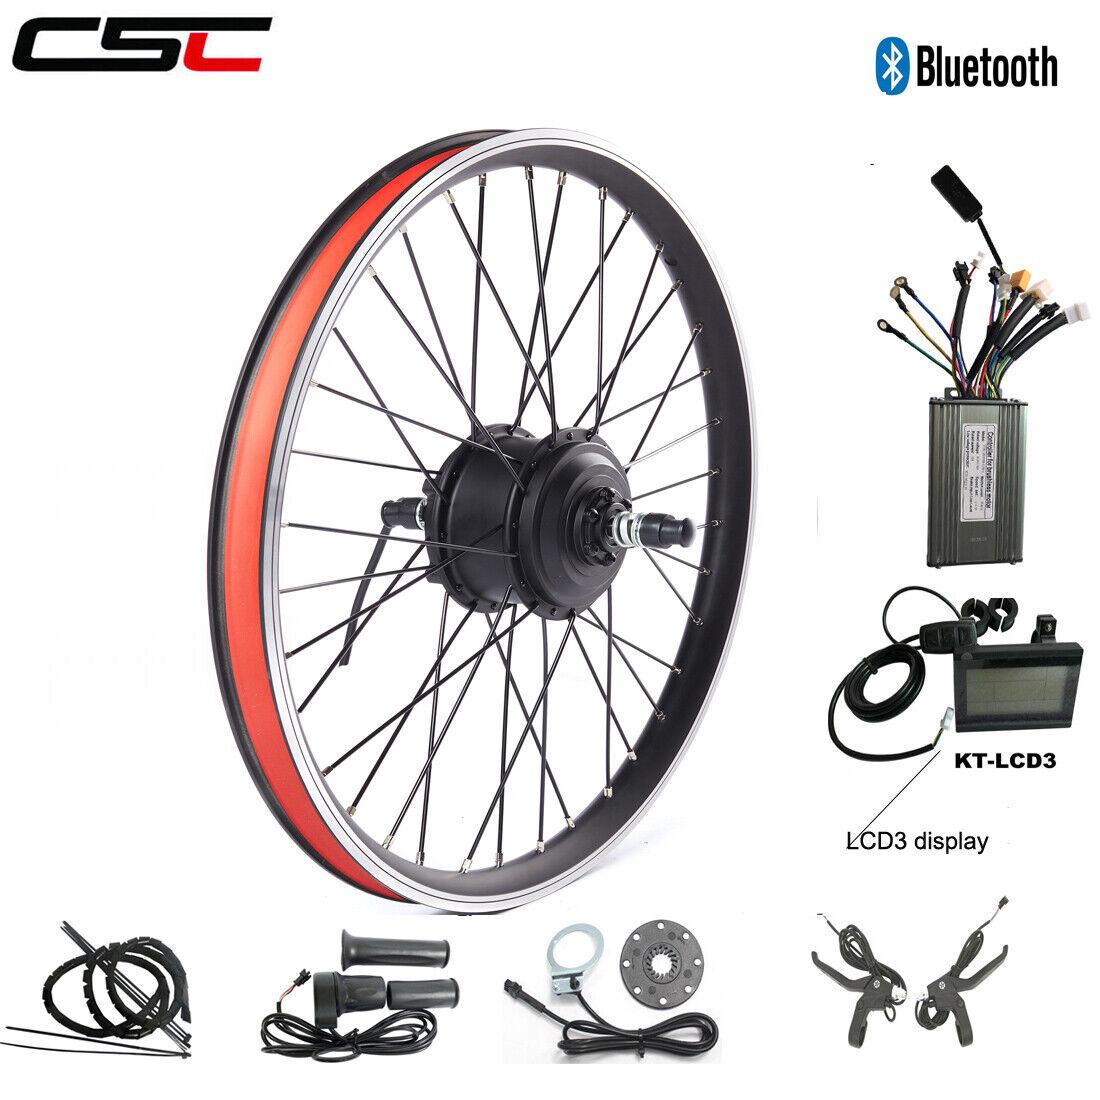 Electric bicicletta Motor rueda Conversion Kit 36V 250W 350W 500W blutooth Ebicicletta